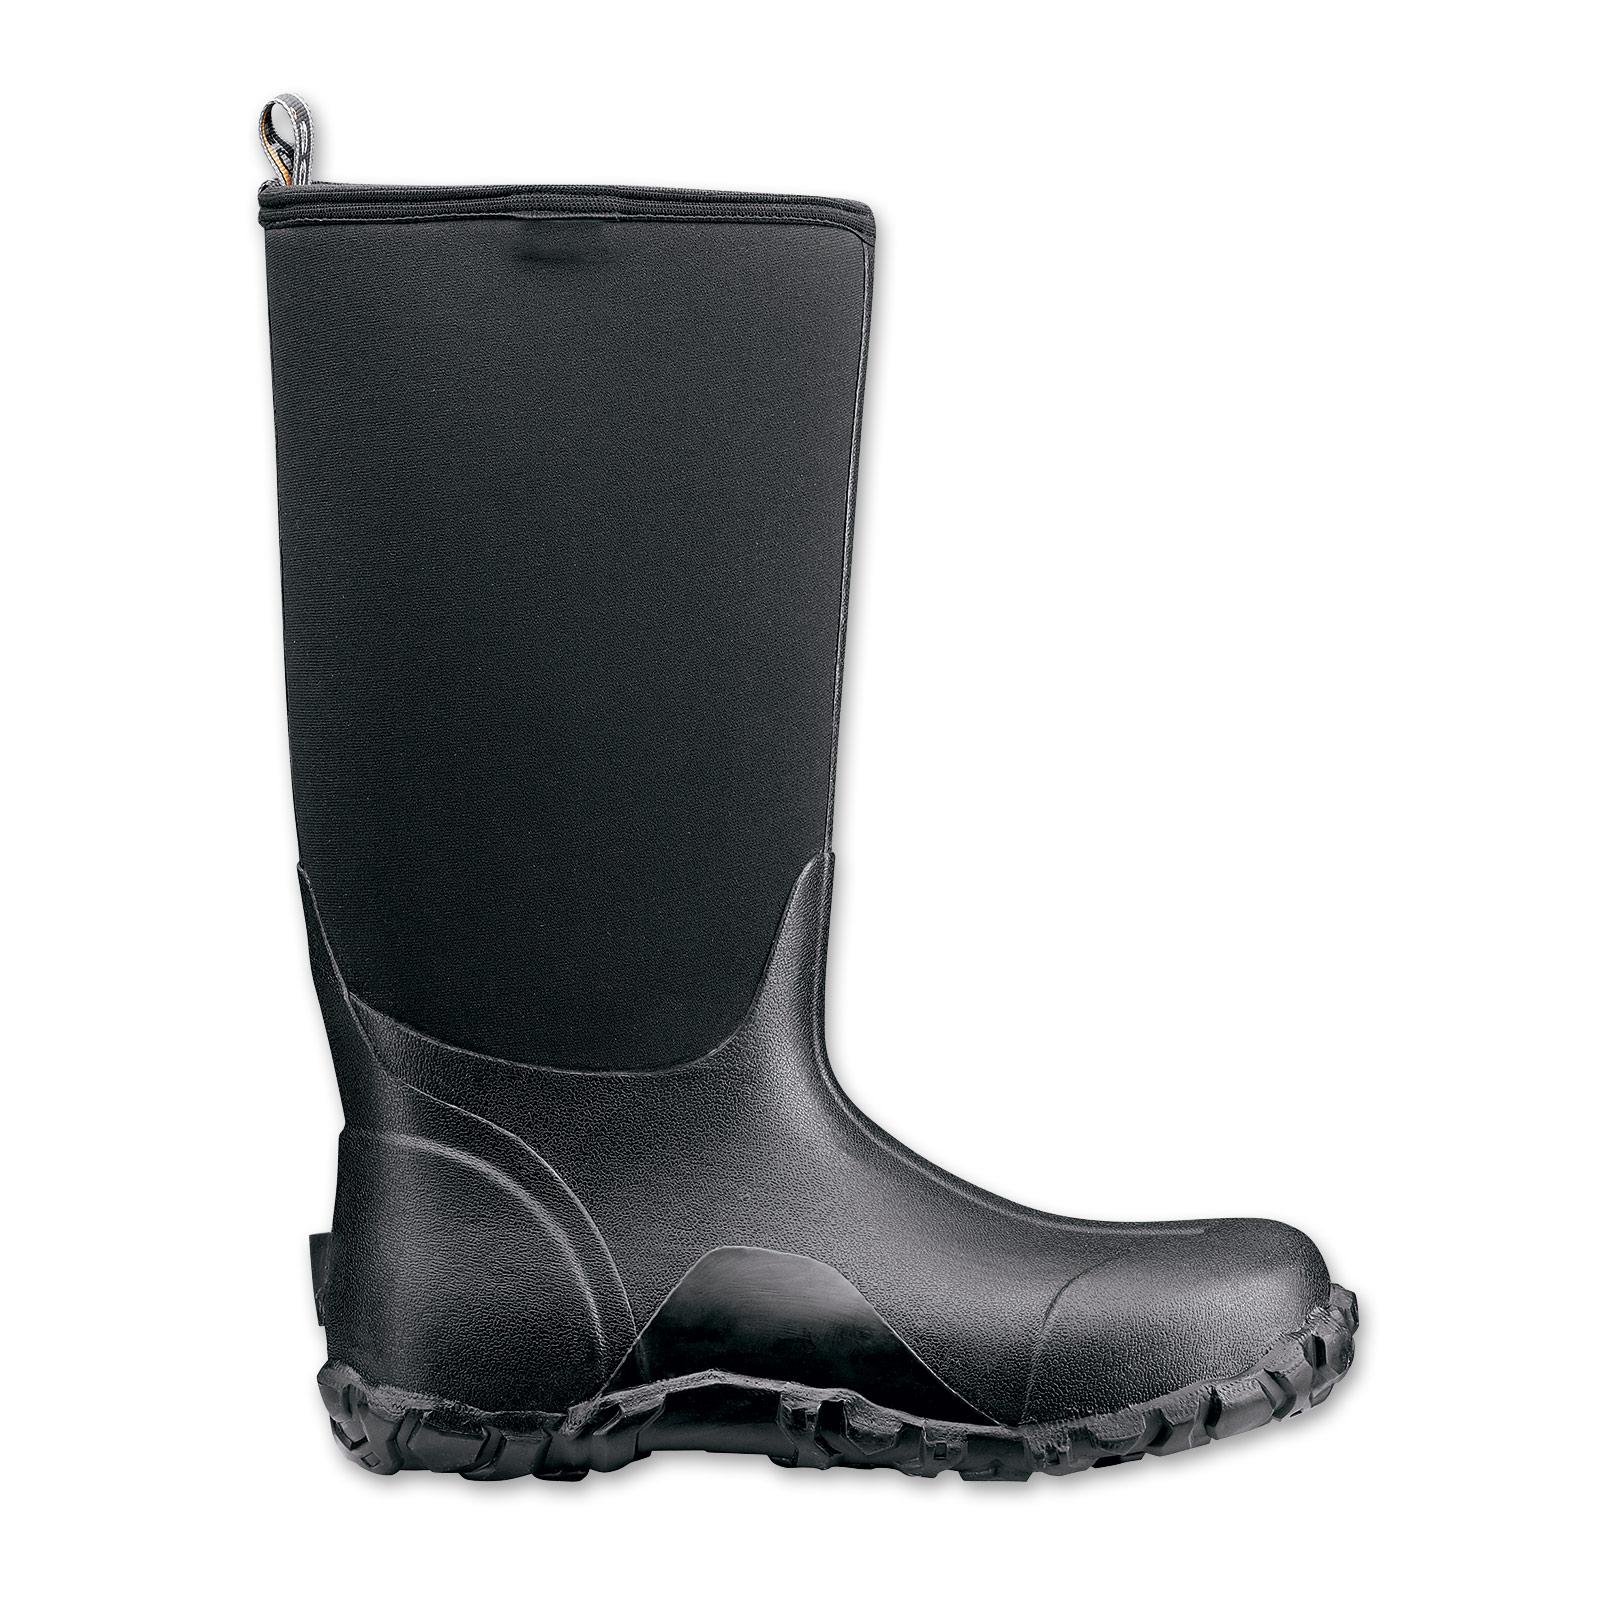 419370fd8fe2a Men's Durable Warm Winter Bogs Zodiac Classic High Boots - Ship to ...